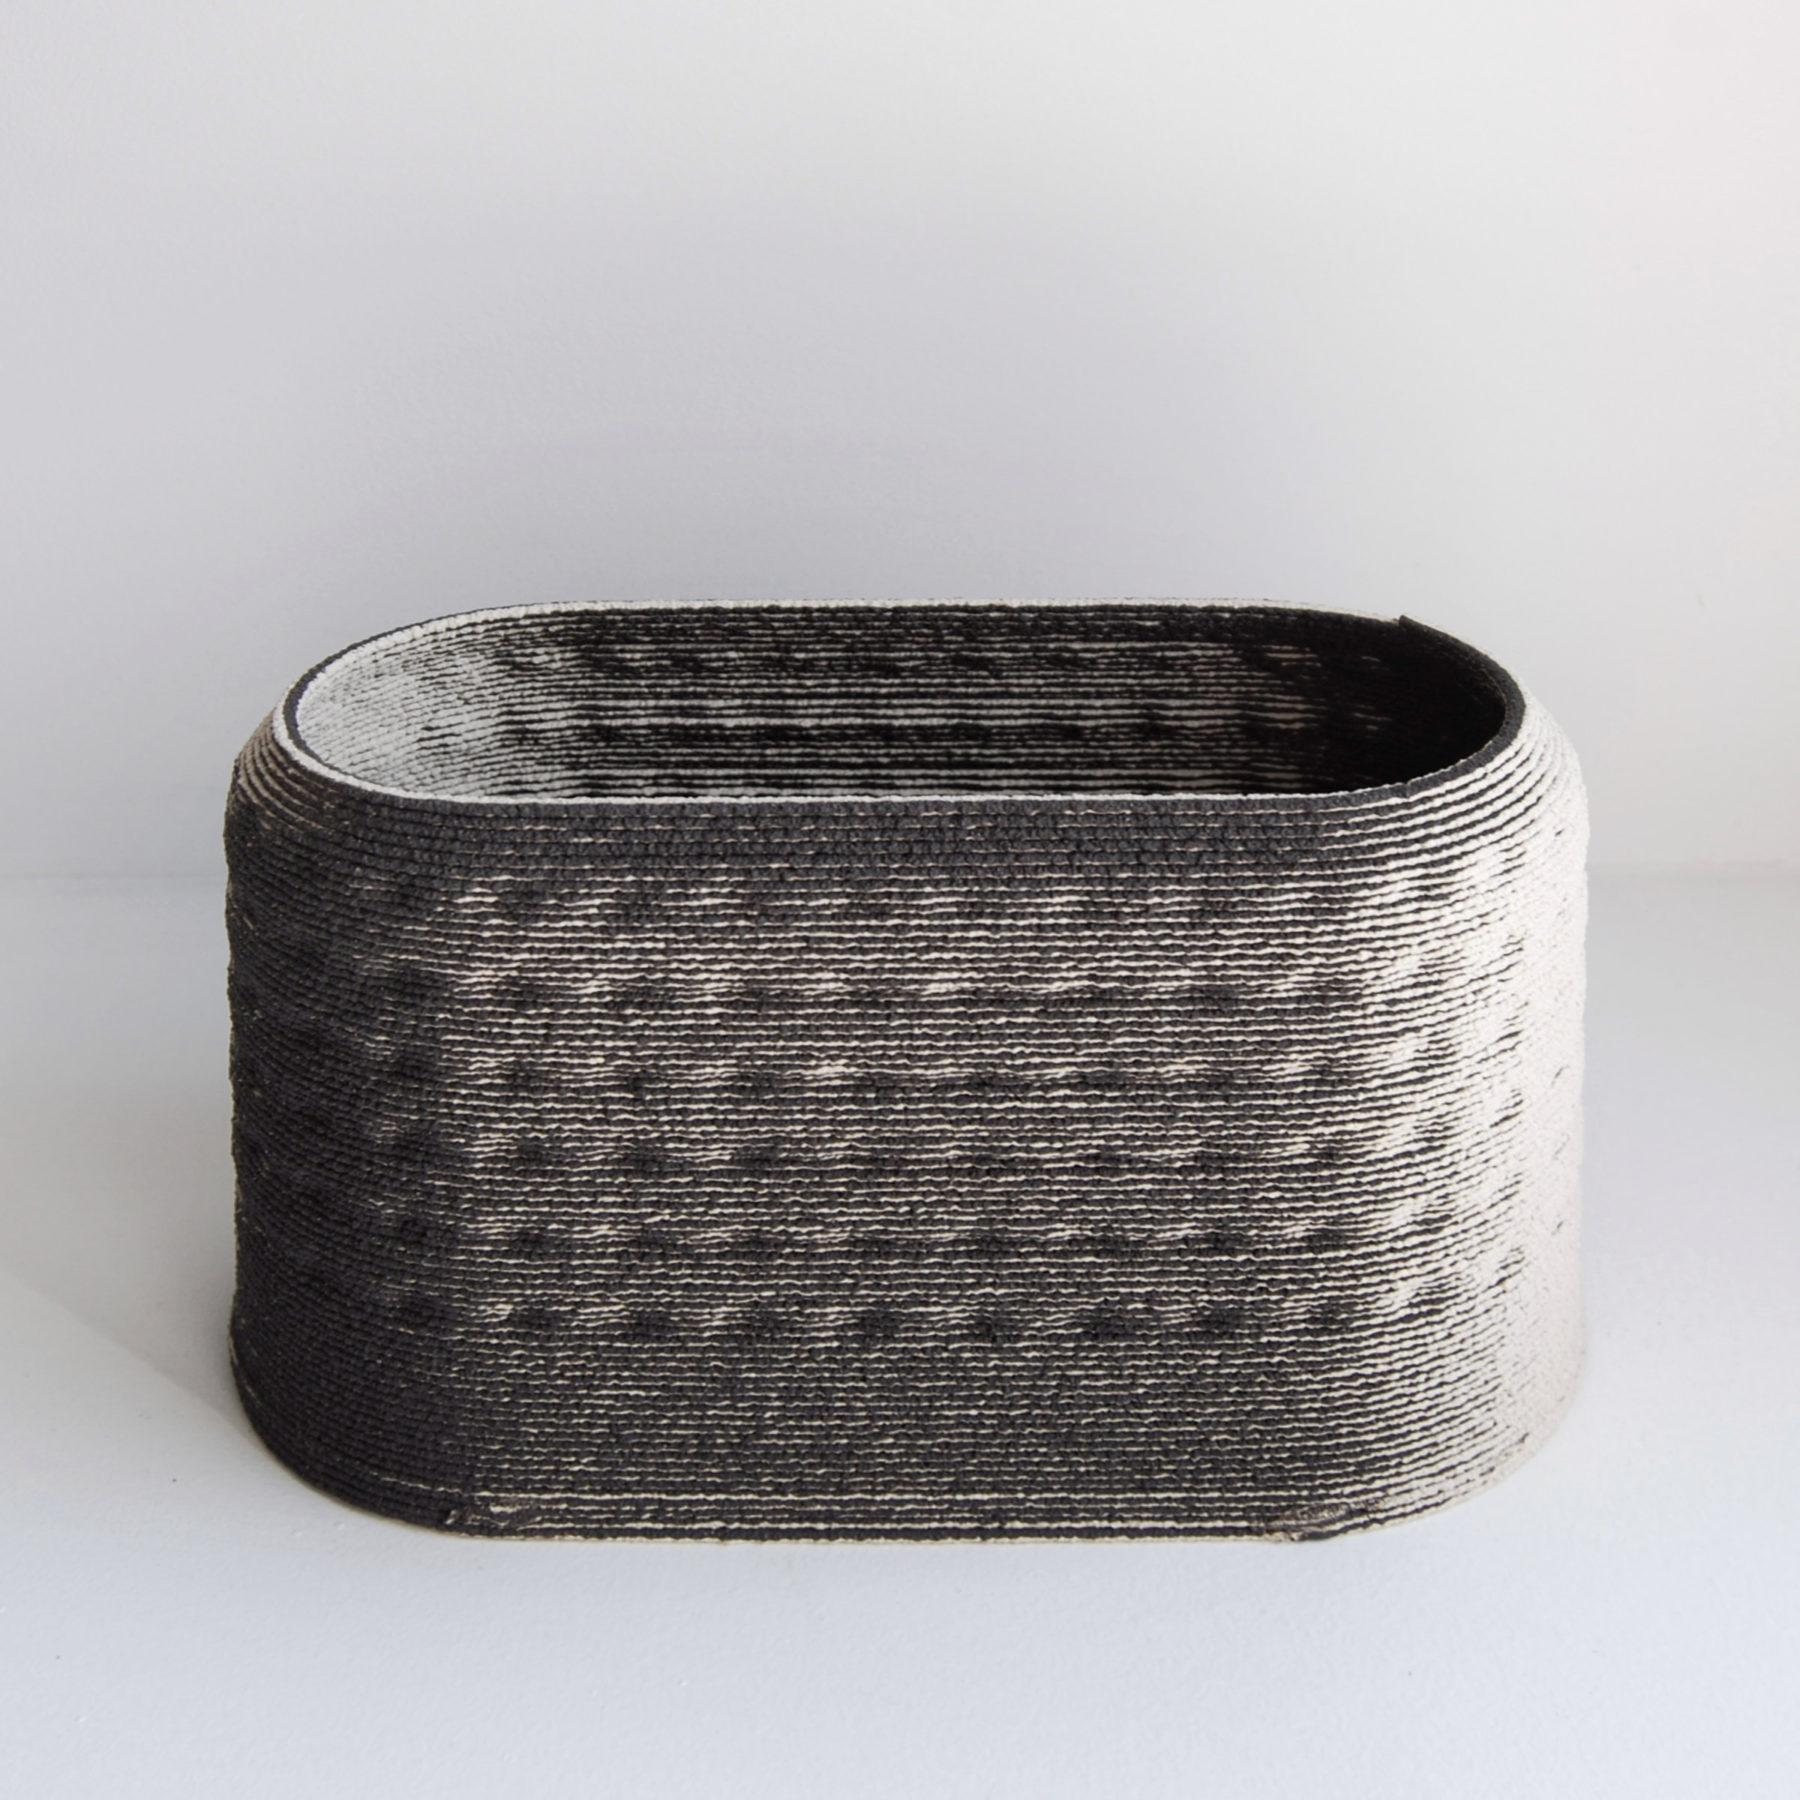 printed ceramic - Impression3D céramique - 8FabLab | www.bold-design.fr